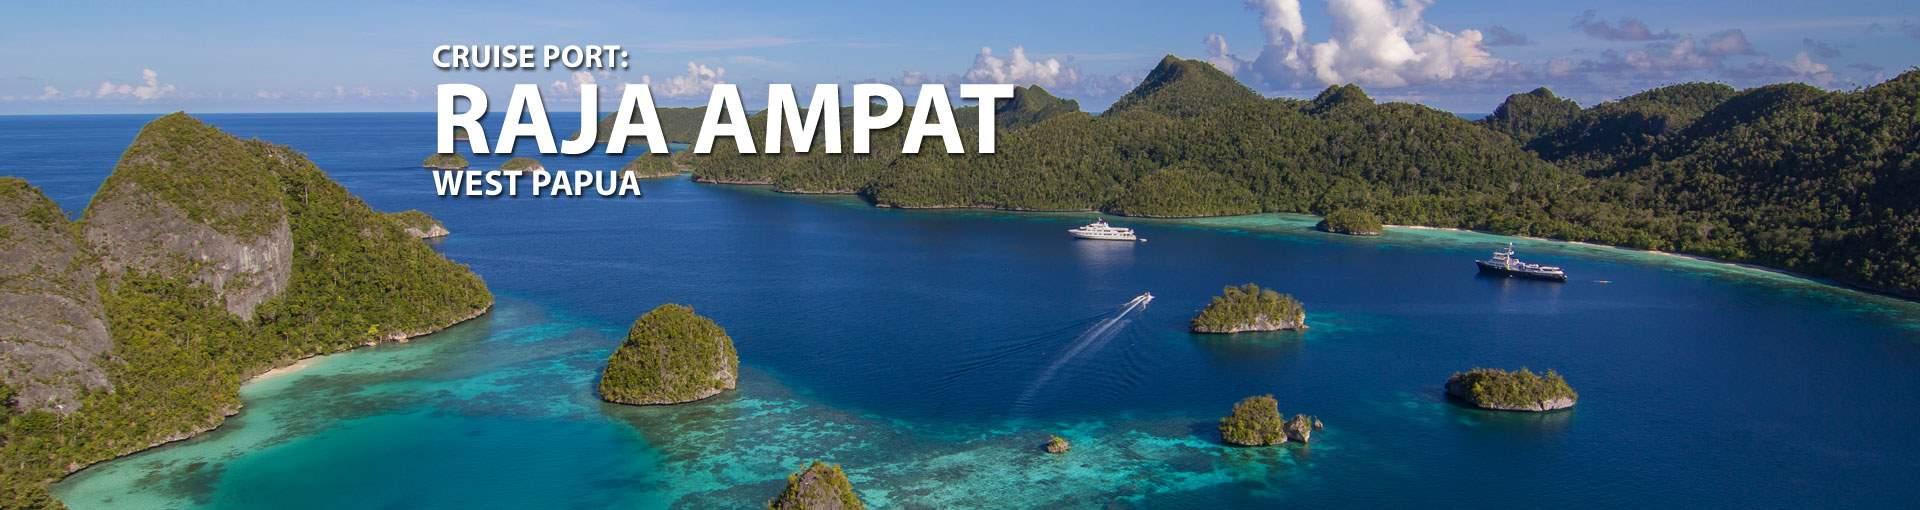 Cruises to Raja Ampat, West Papua